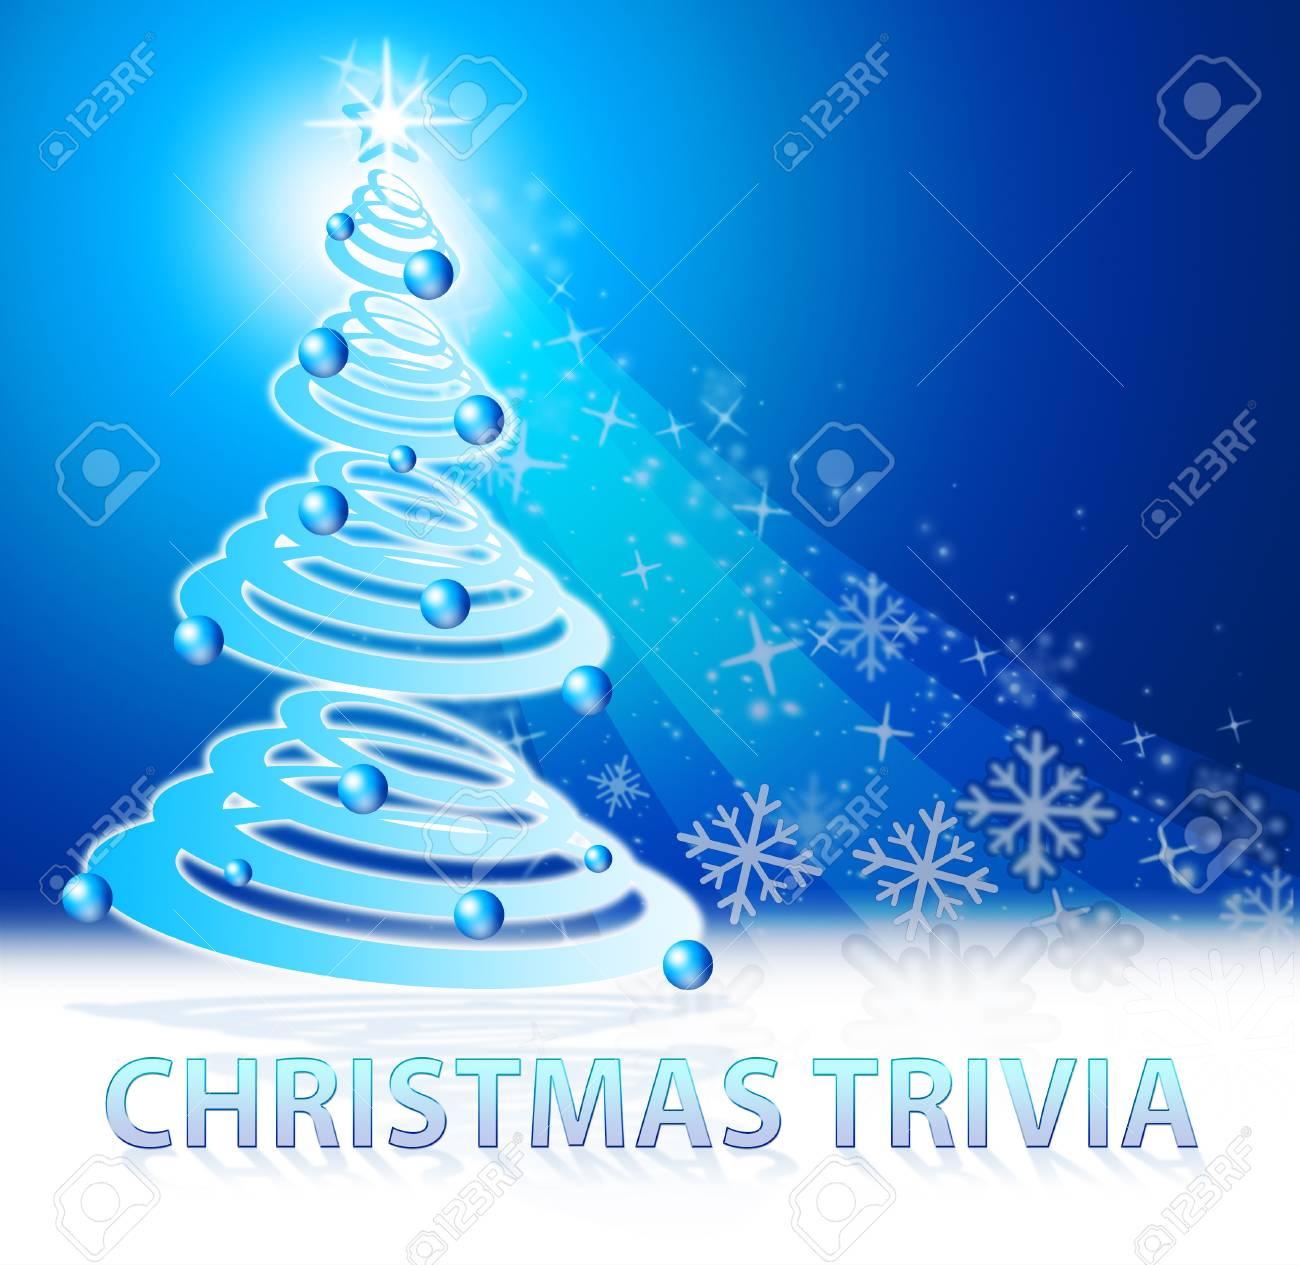 Christmas Trivia Facts.Stock Illustration